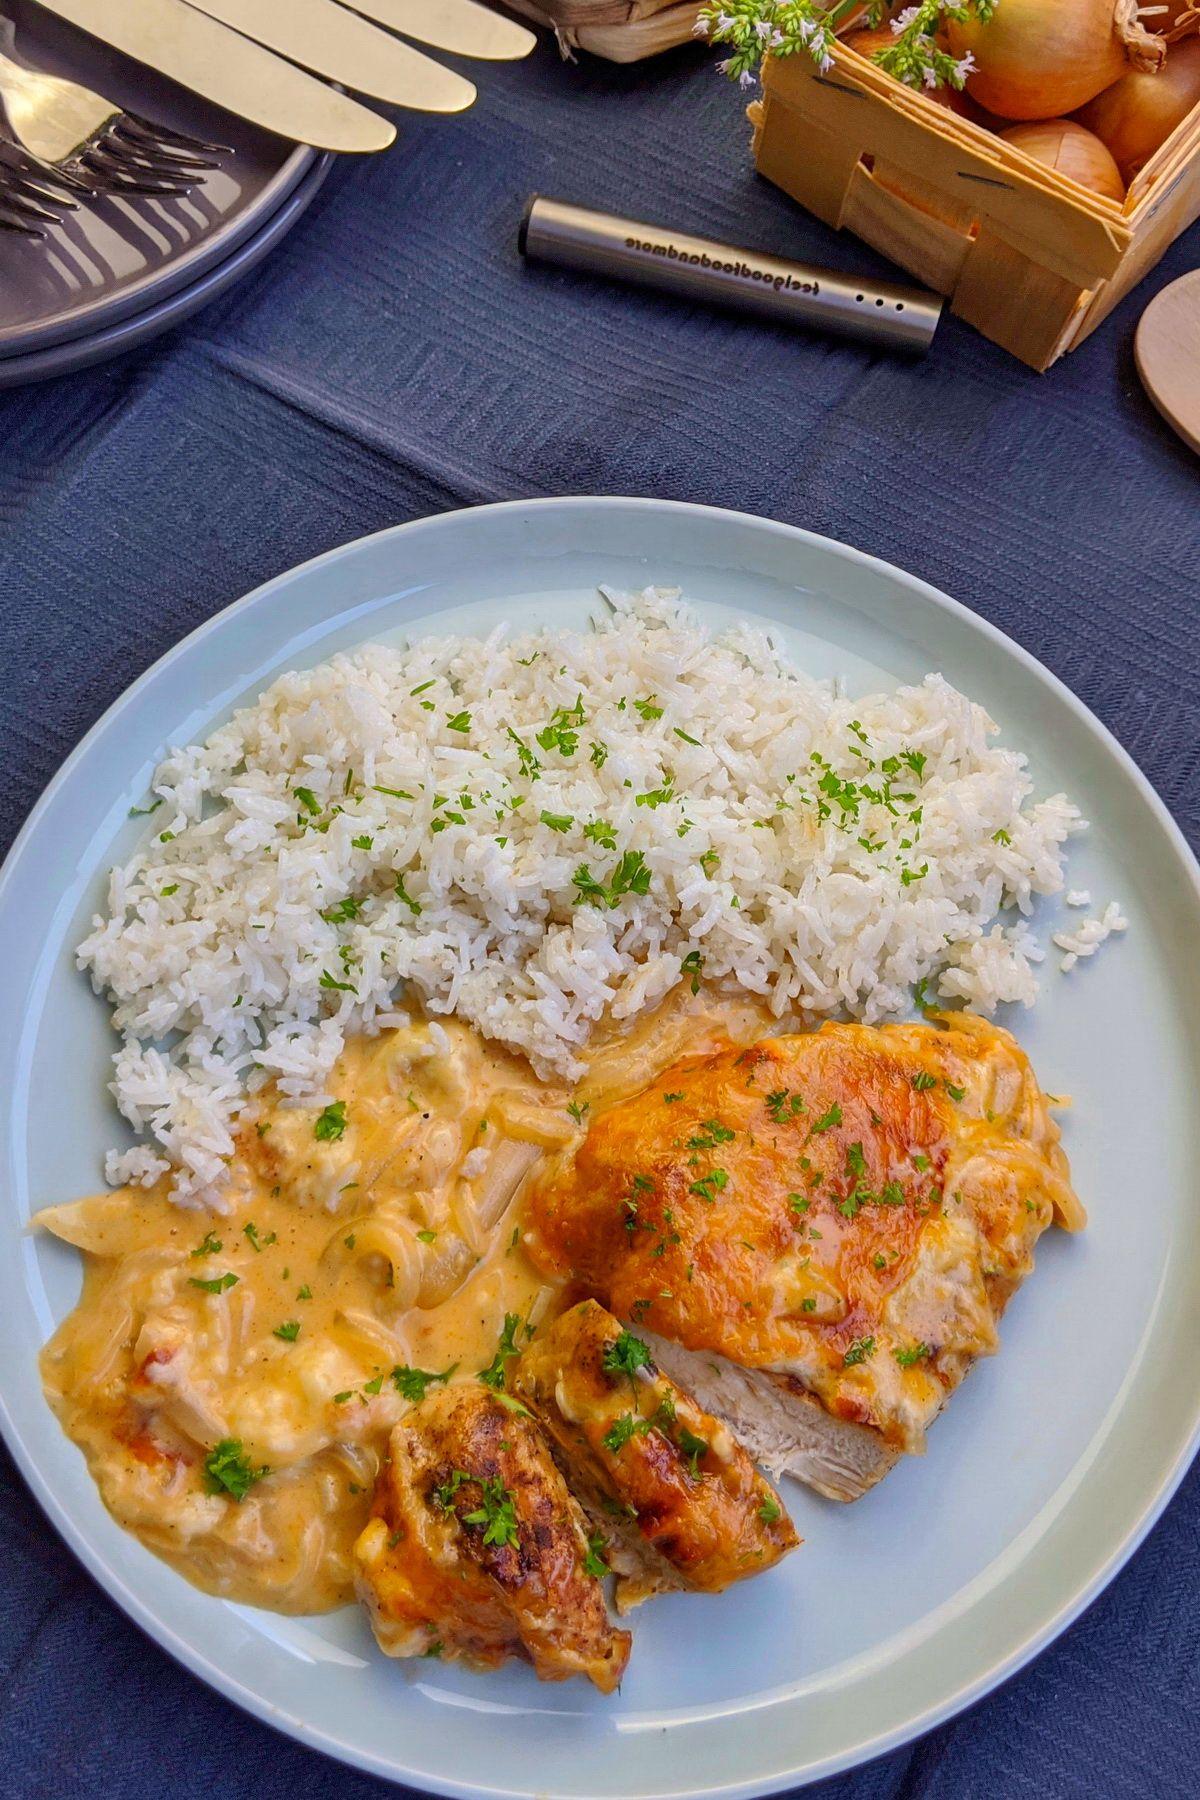 Zwiebel-Sahne-Hähnchen –Einfach, lecker, gelingt immer - instakoch.de